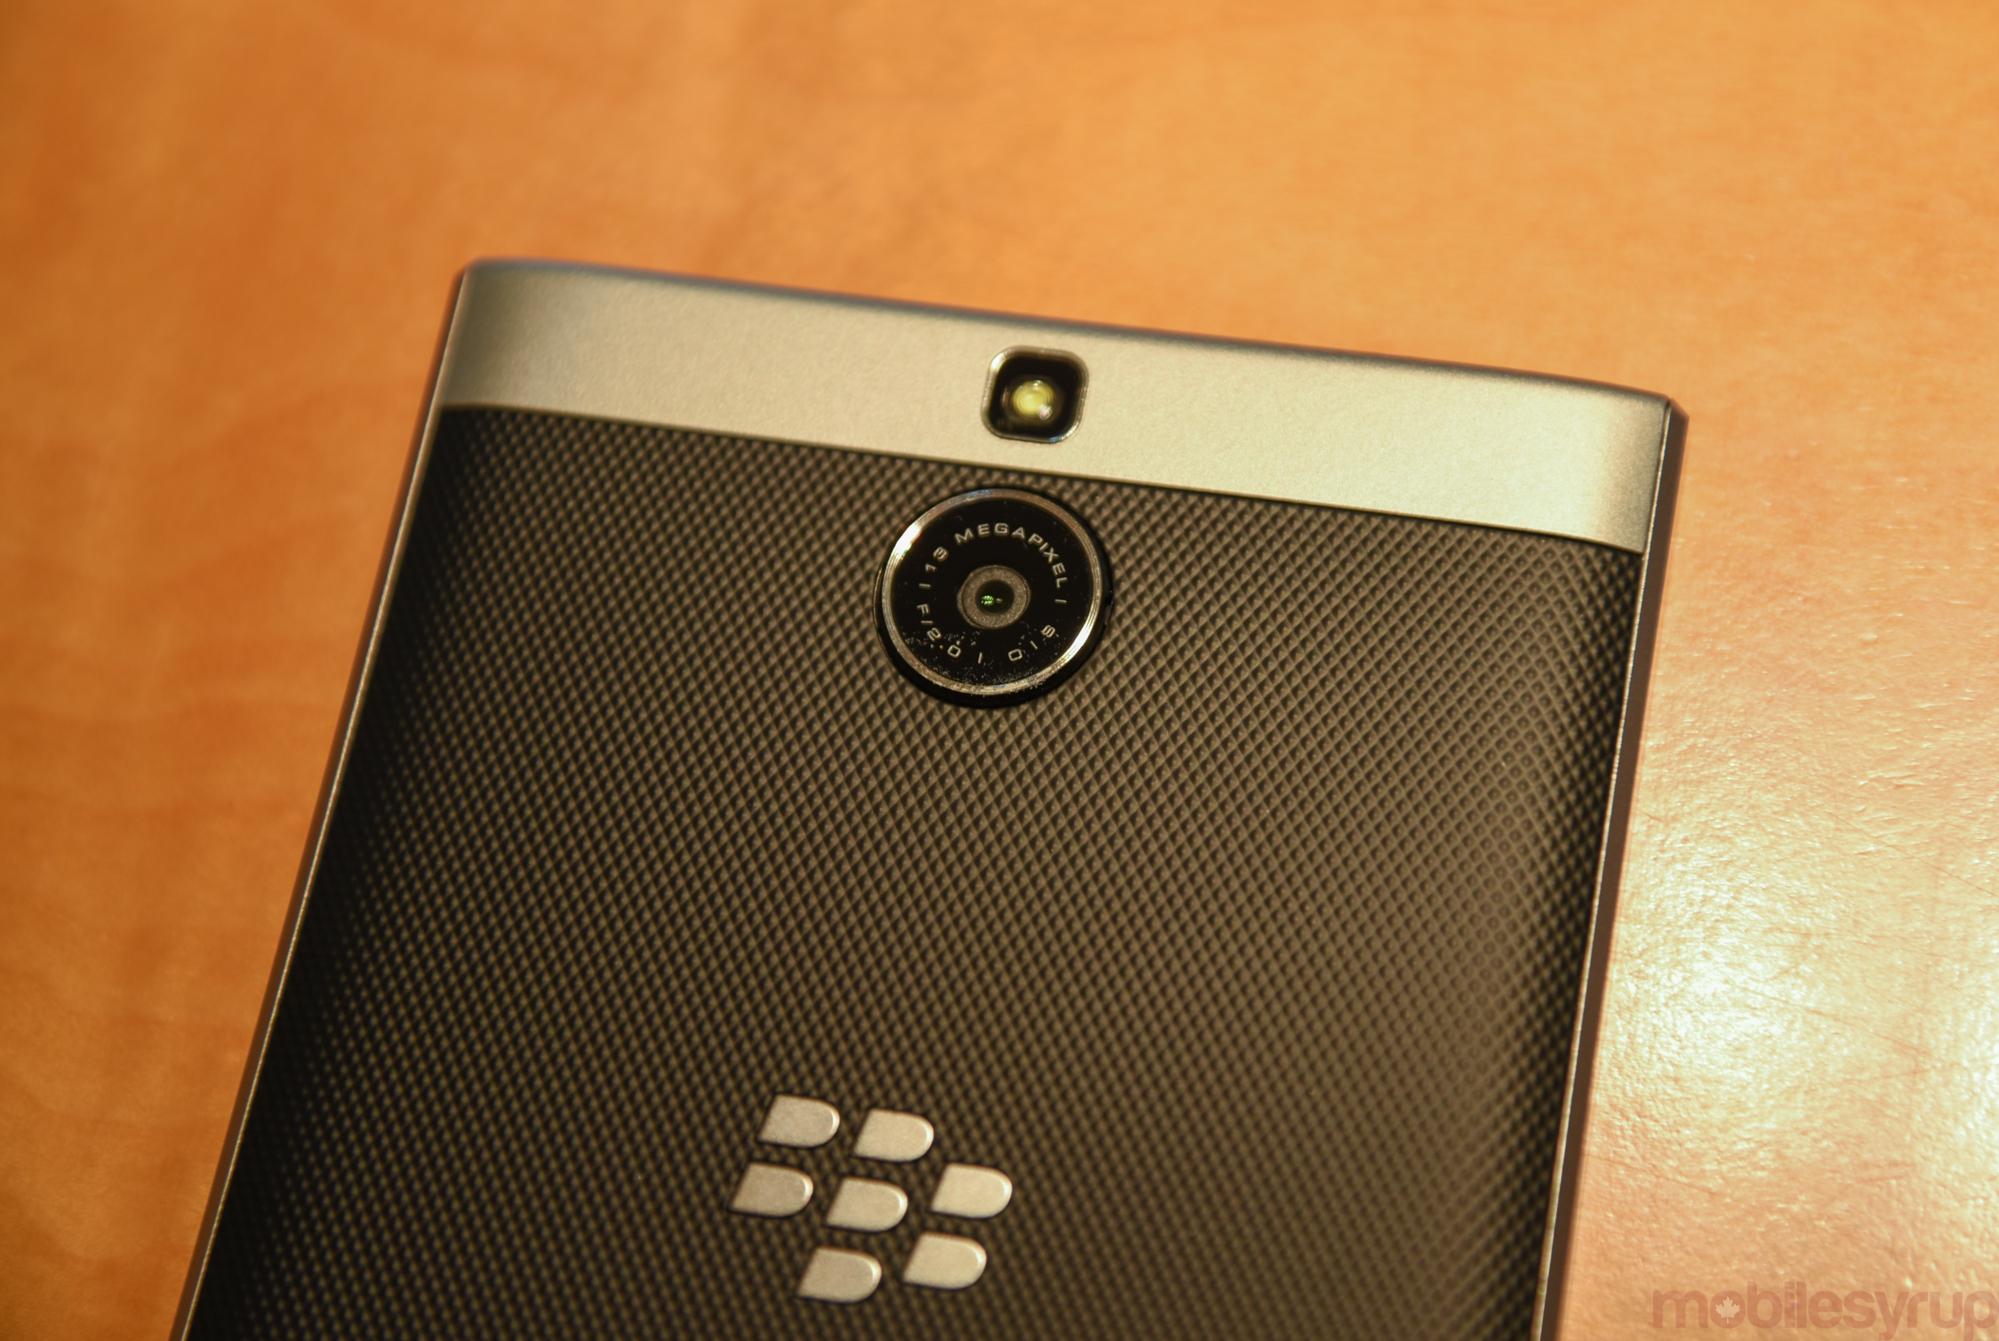 blackberrypassportsilveredition-0311